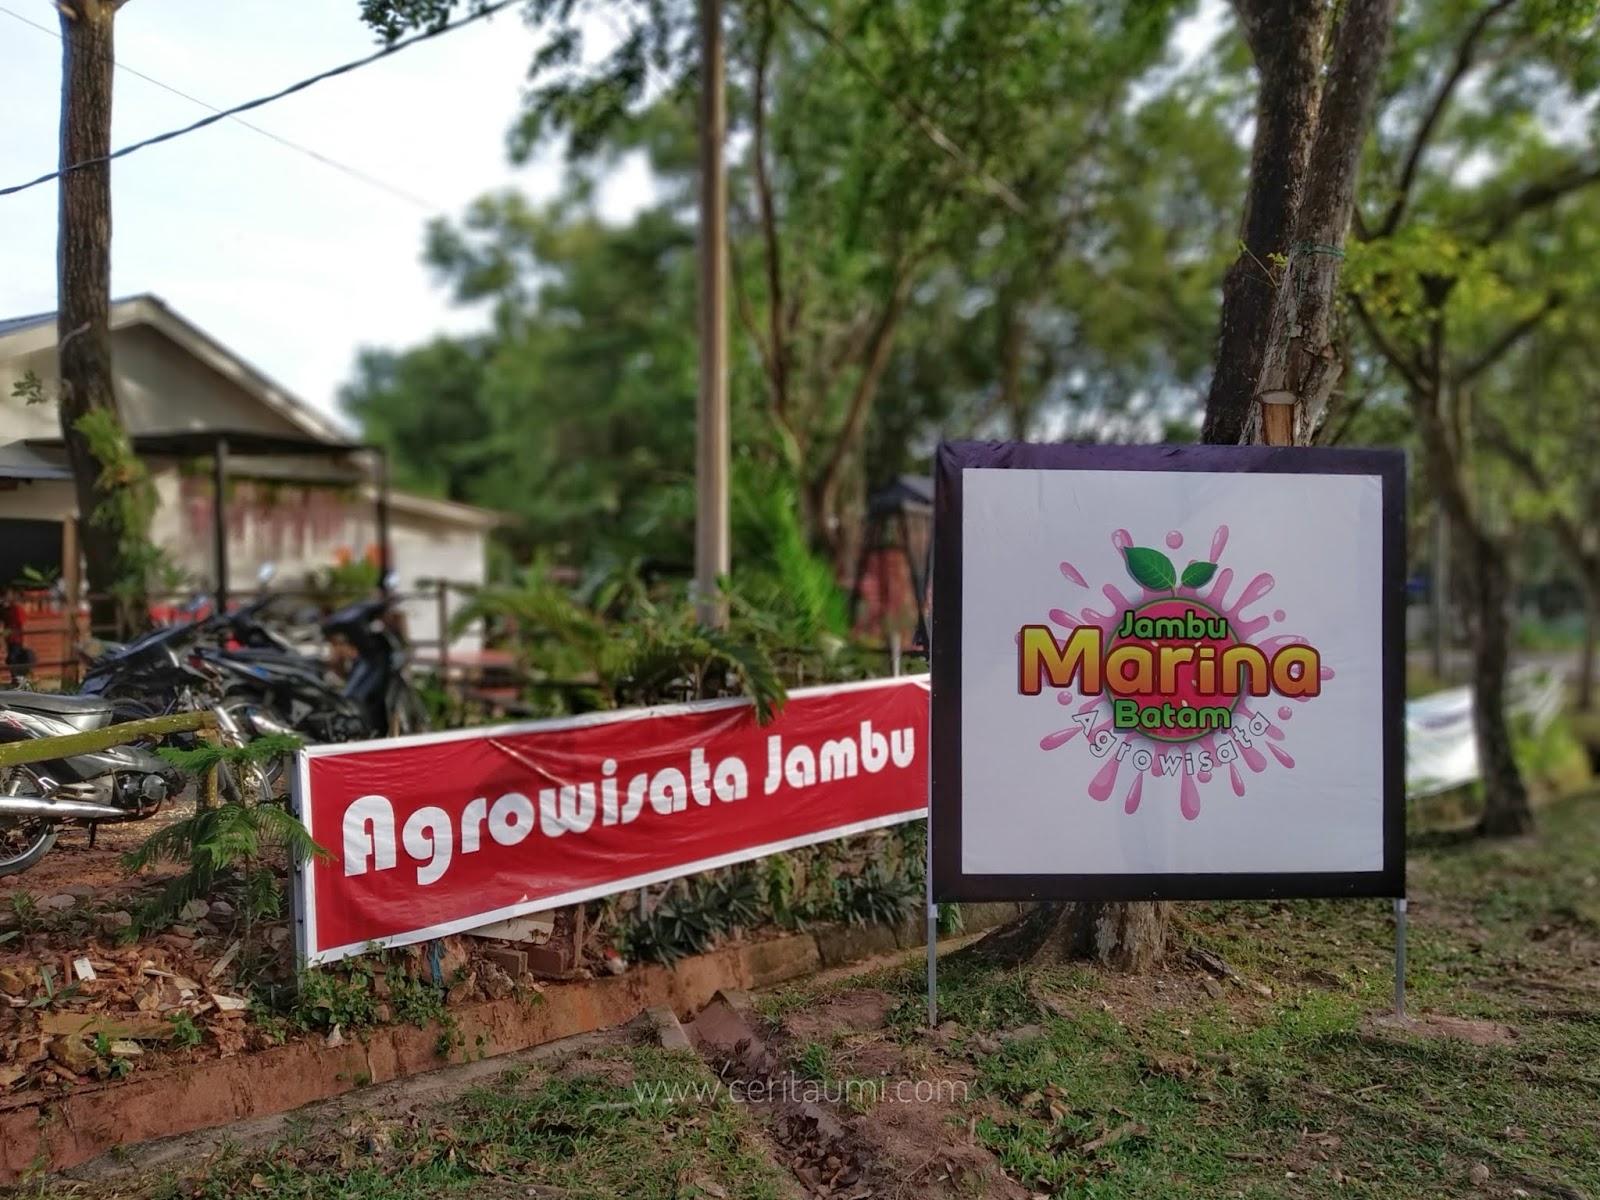 Agrowisata Jambu Marina Batam Lokasi Baru Banyak Wahana